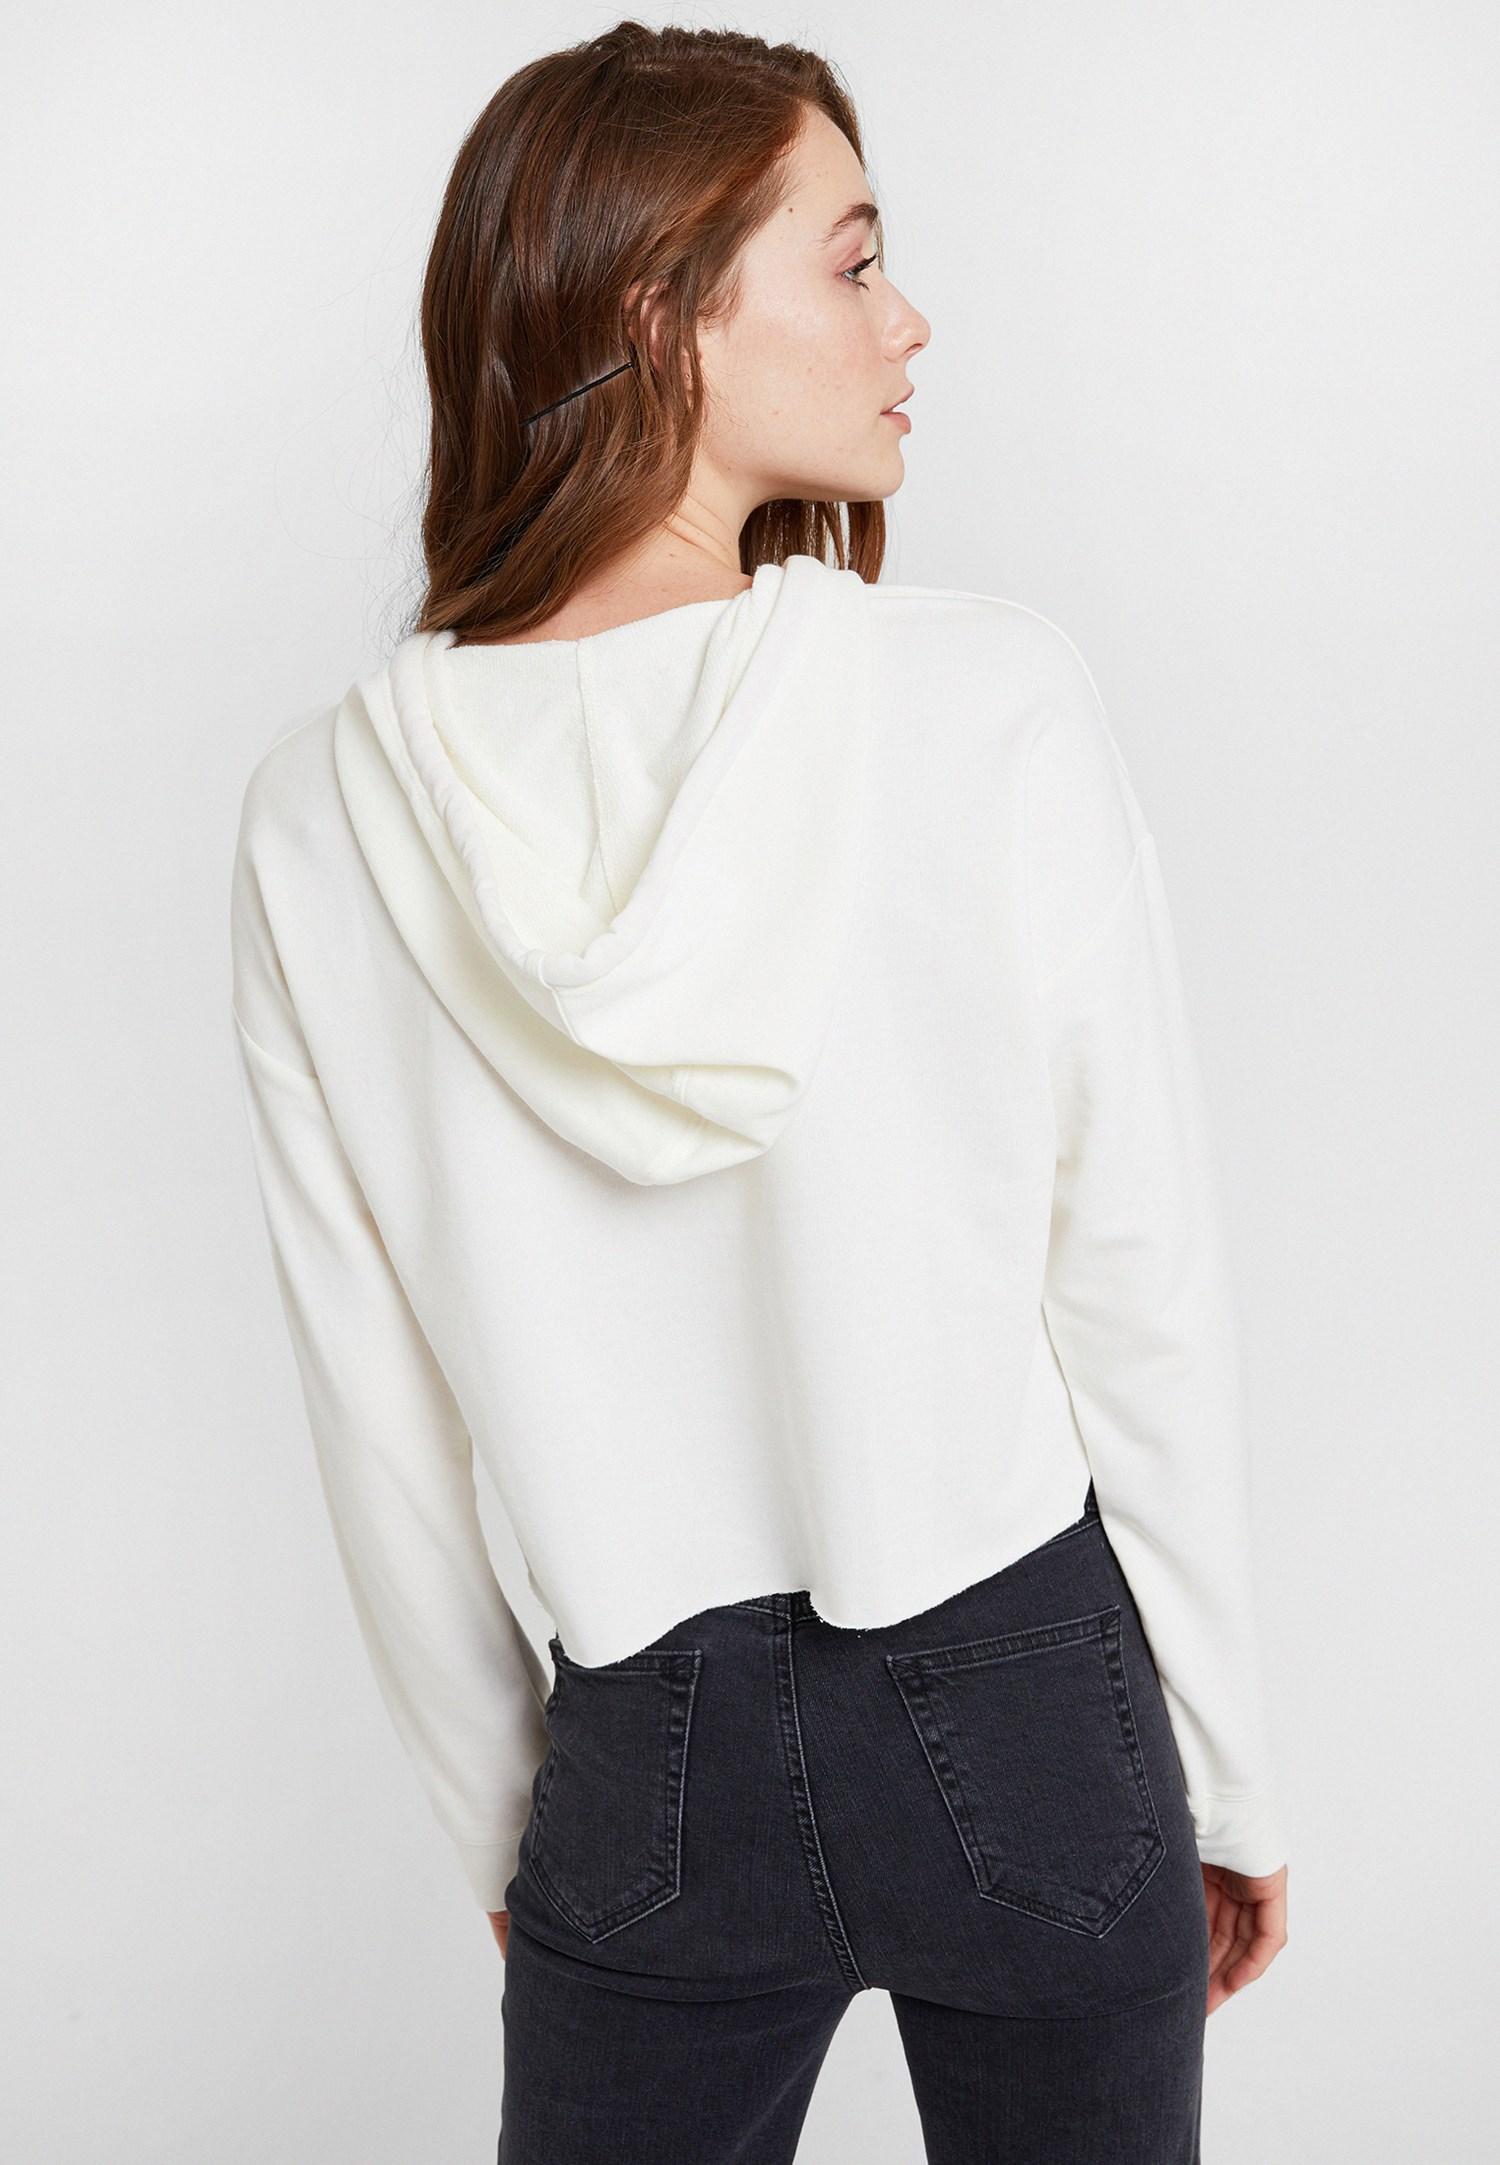 Bayan Krem Kapüşonlu Kısa Sweatshirt